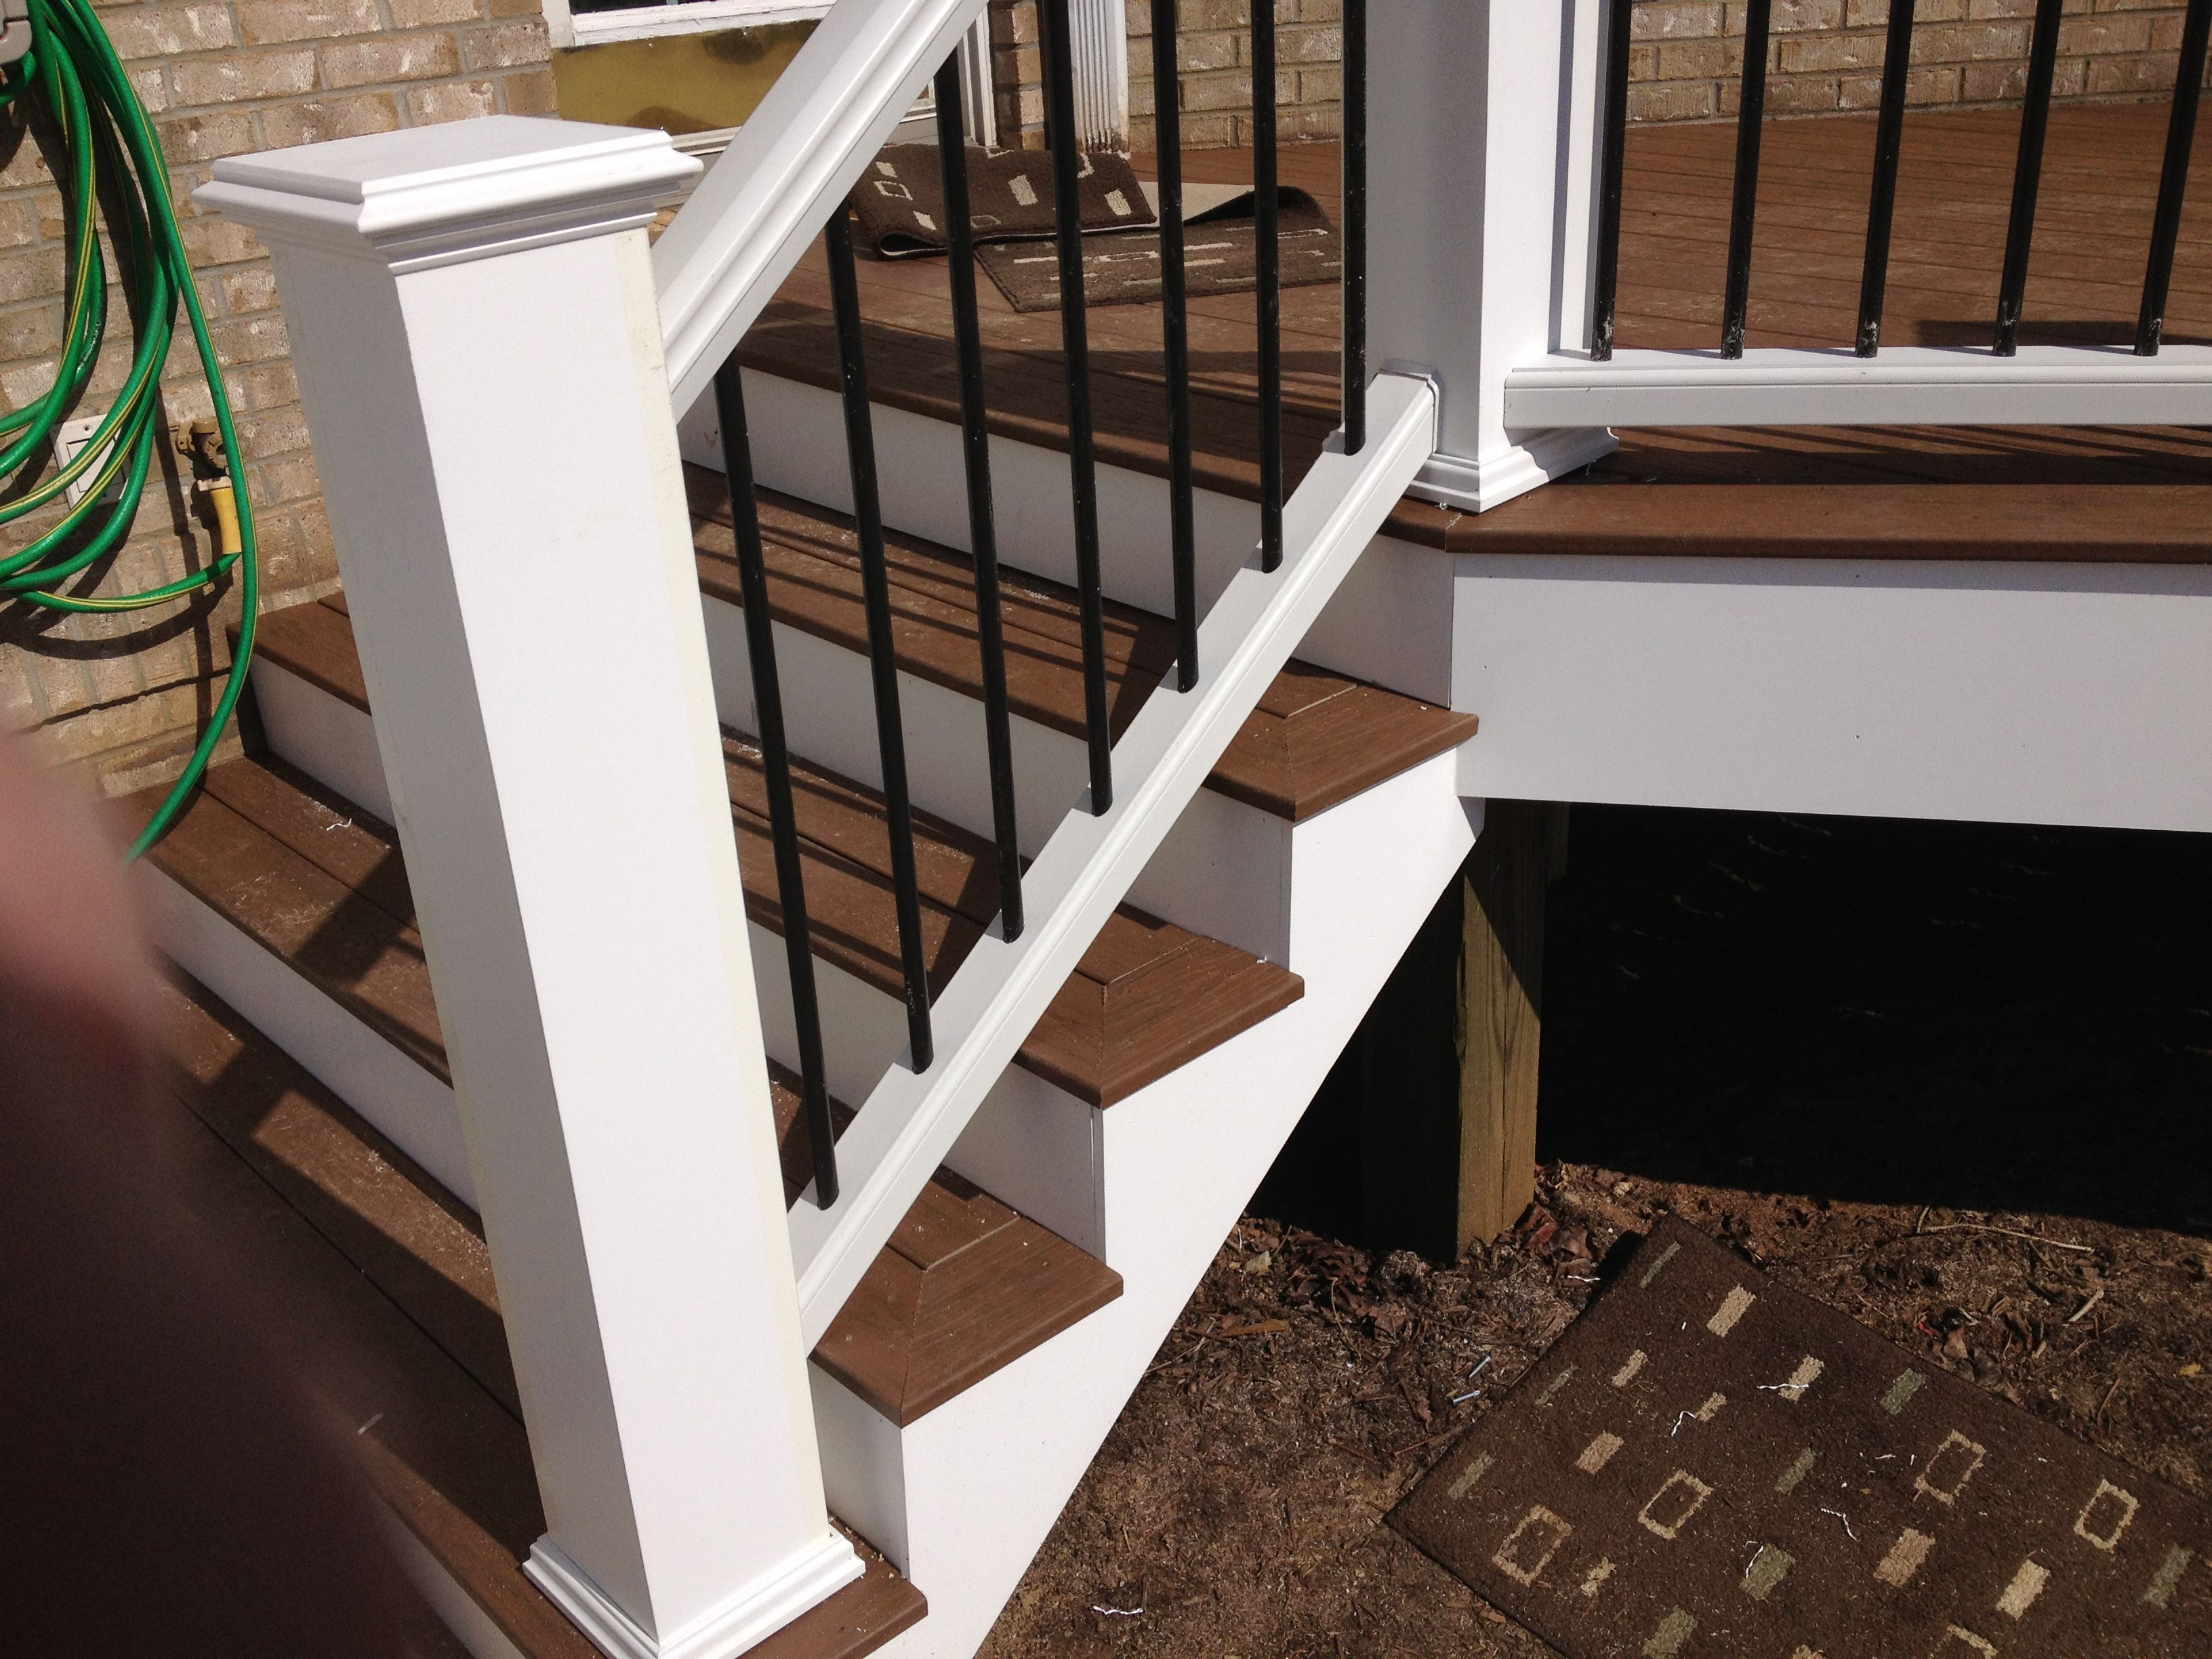 Wtsenates Best Ideas Trex Decking With Railing And Stairs | Trex Enhance Stair Railing | Composite Decking | Trex Transcend | Lighting | Installation Instructions | Vintage Lantern